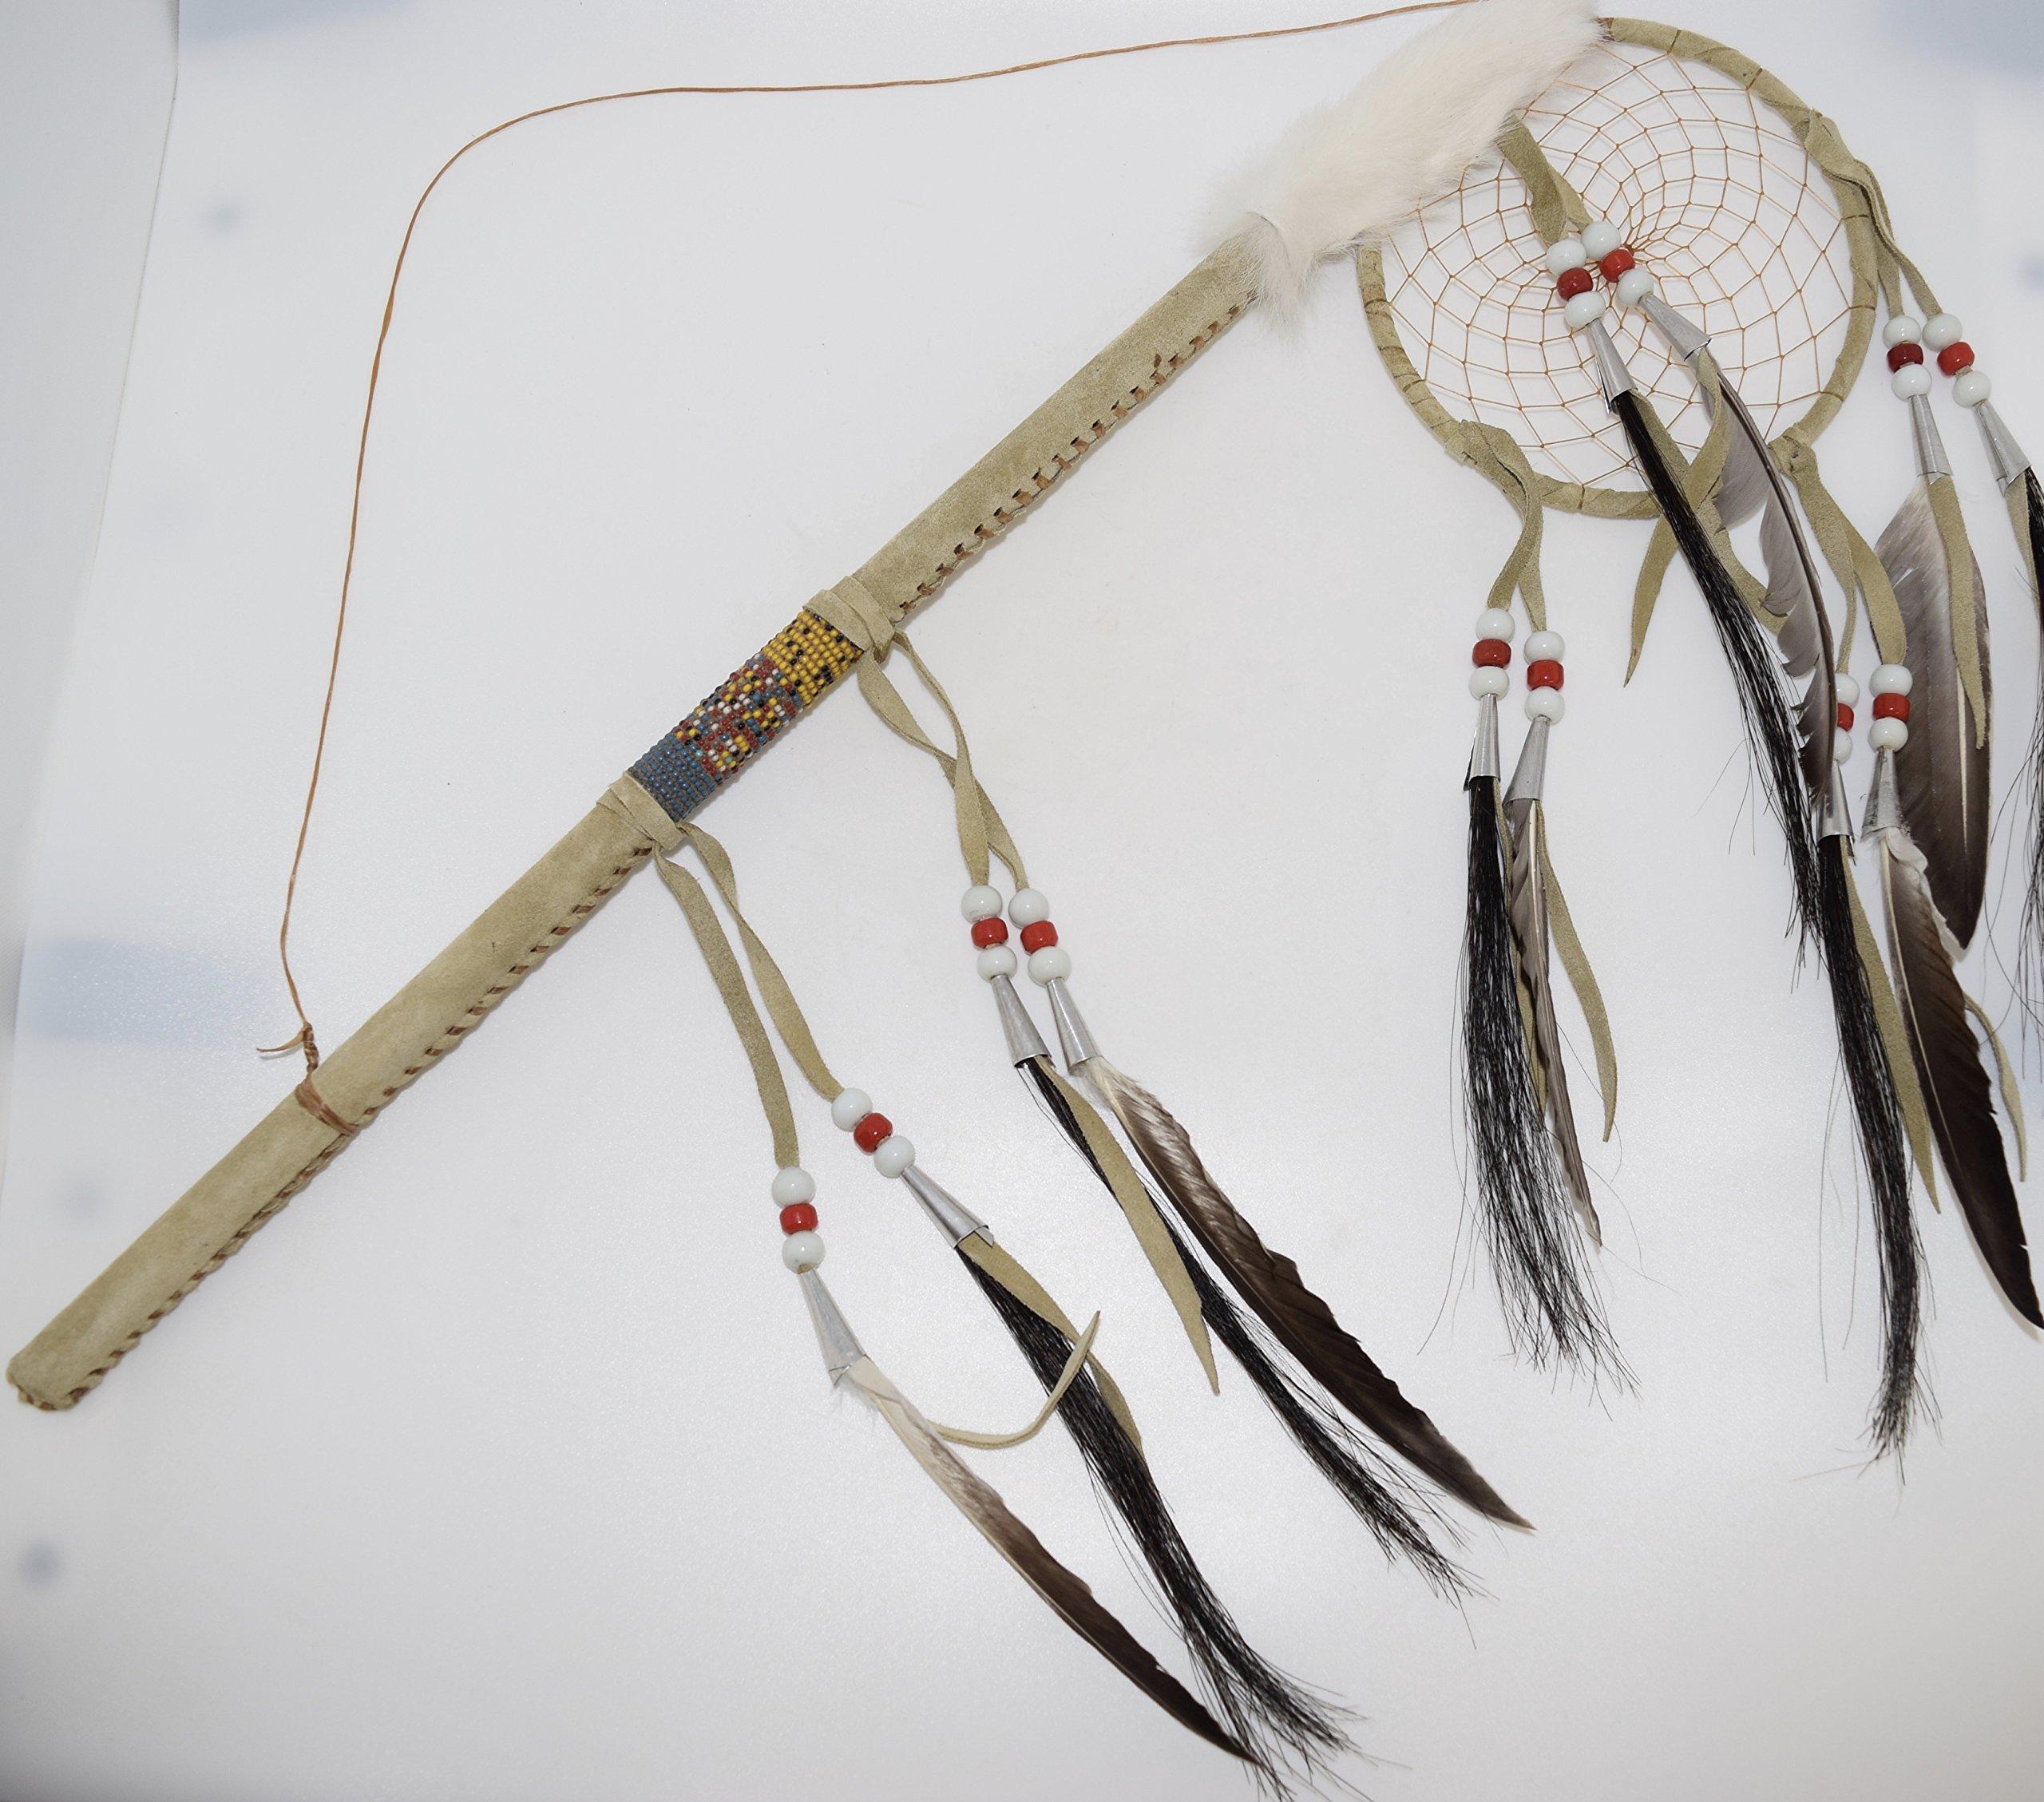 Genuine Handmade Beaded Dreamcatcher Dance Stick Wall Hanging